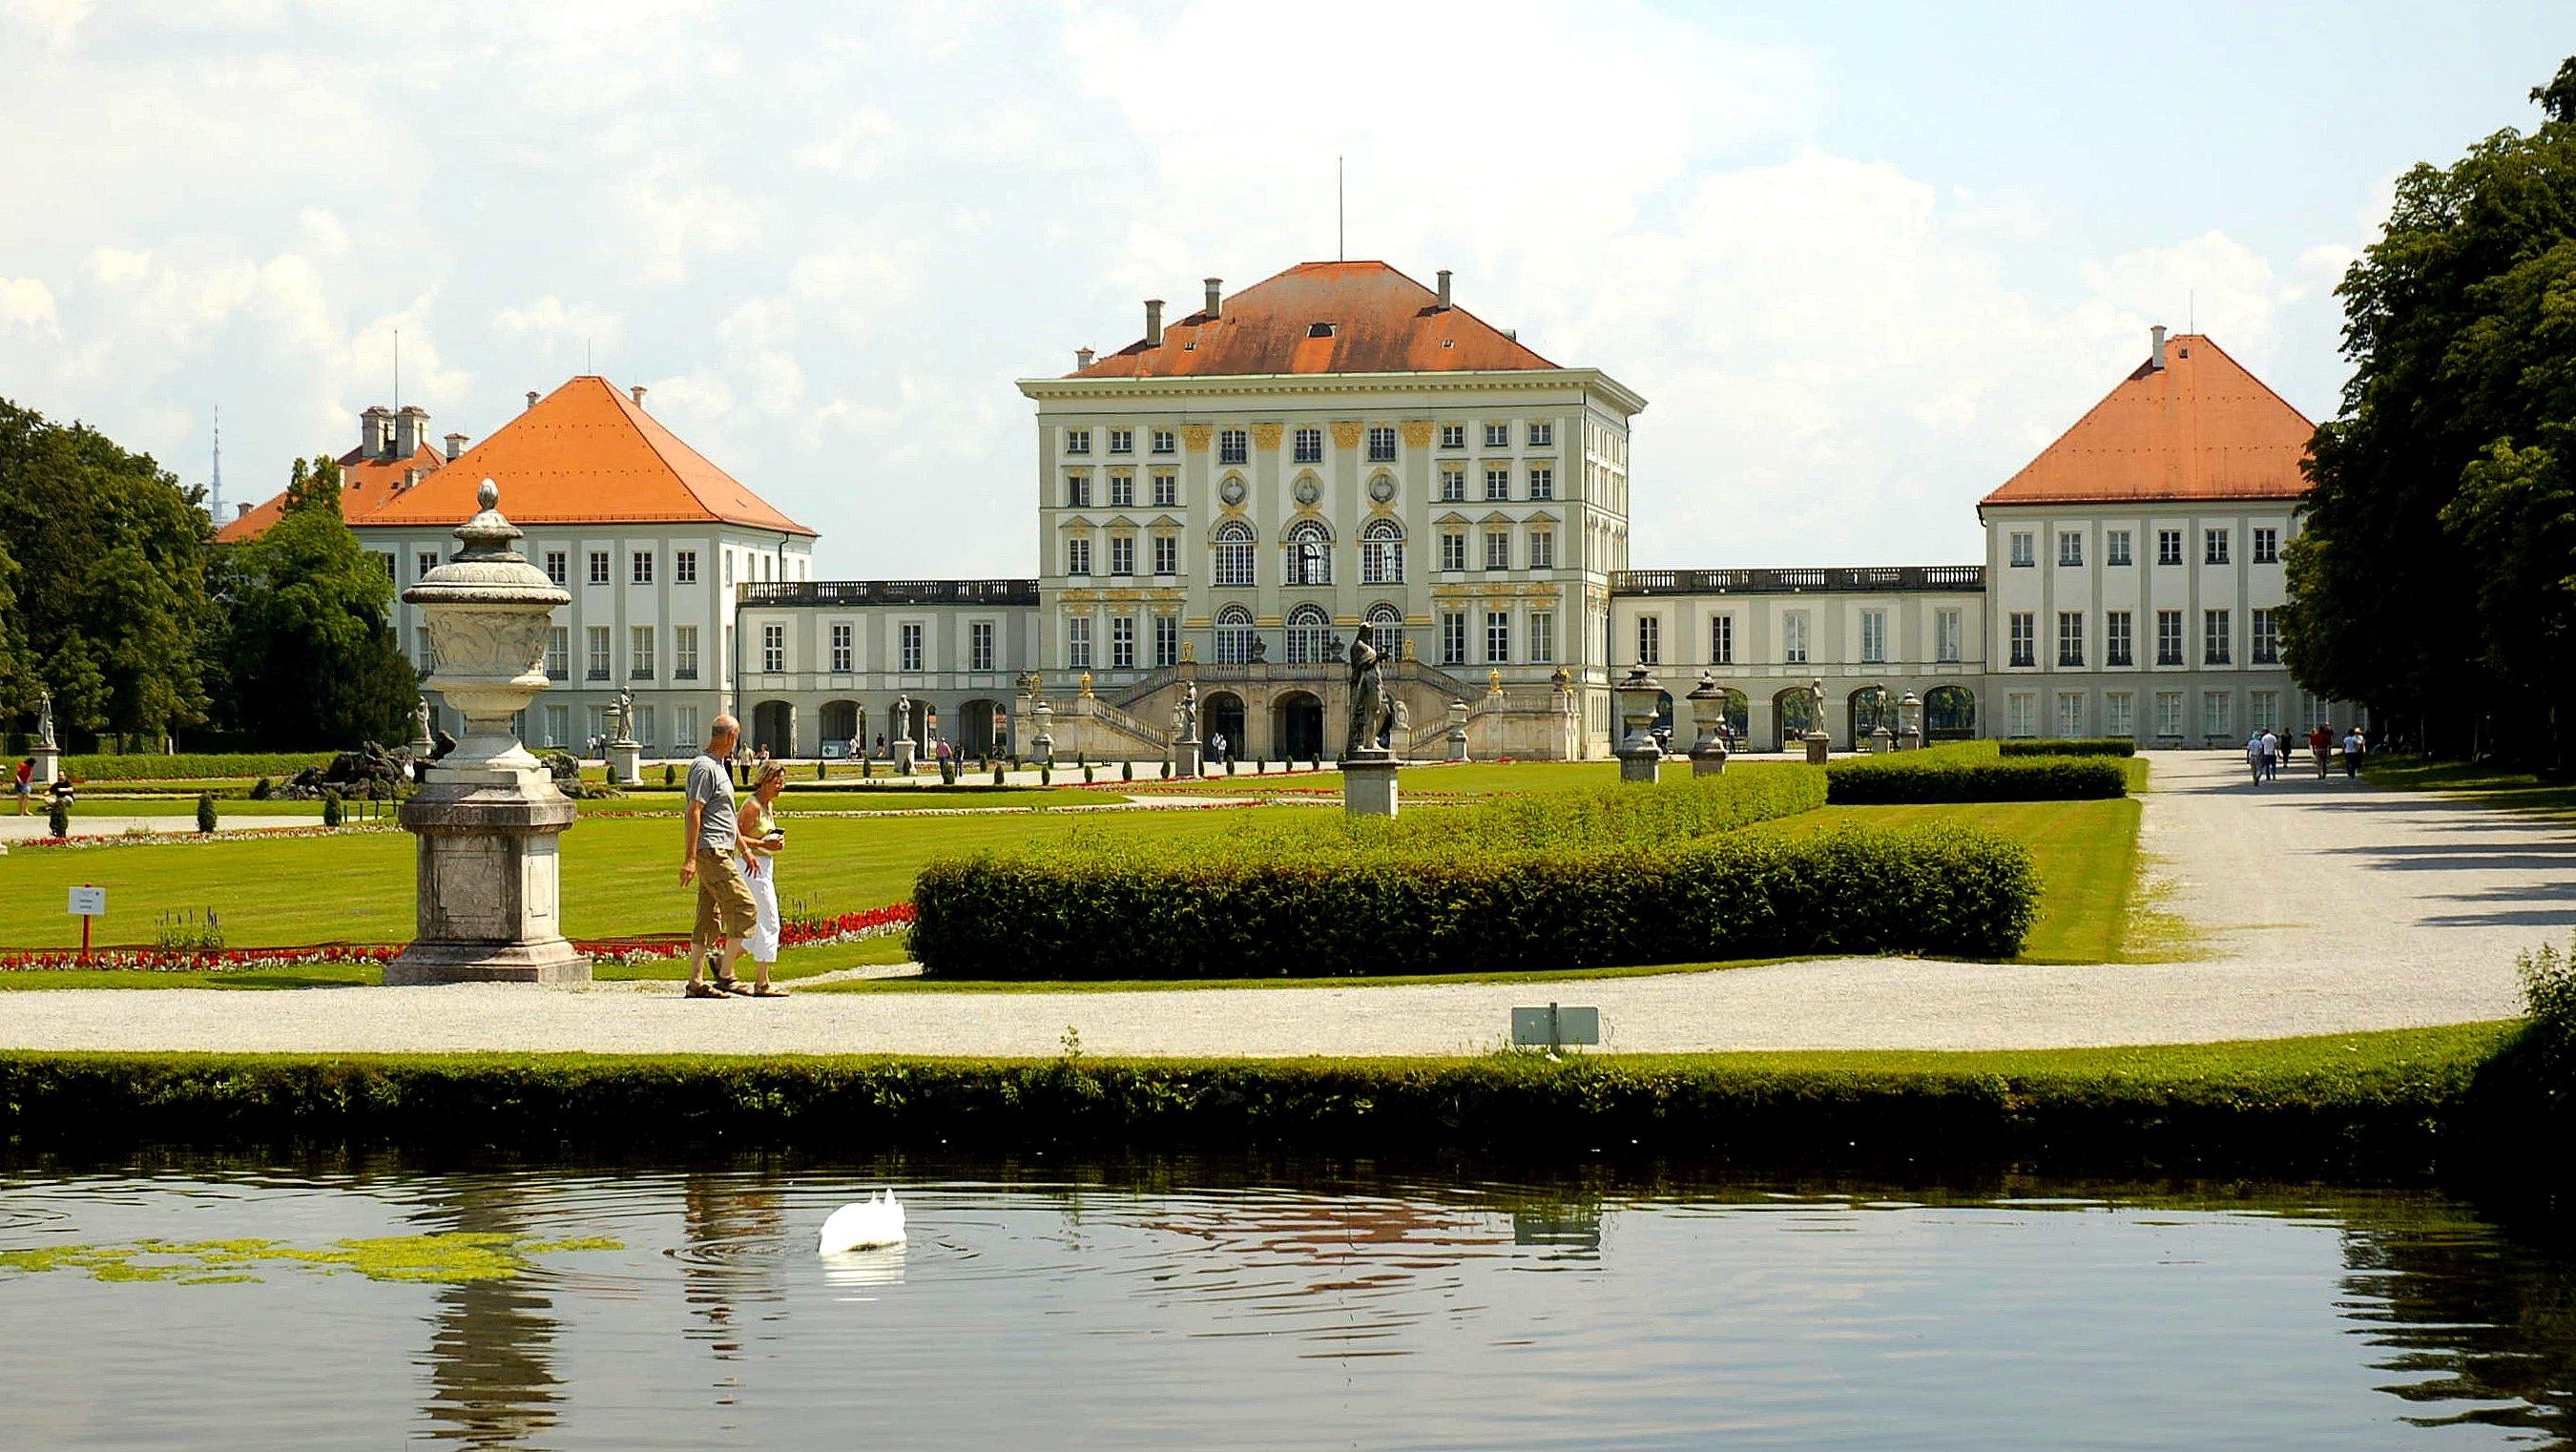 File:Schloss Nymphenburg München.jpg - Wikimedia Commons